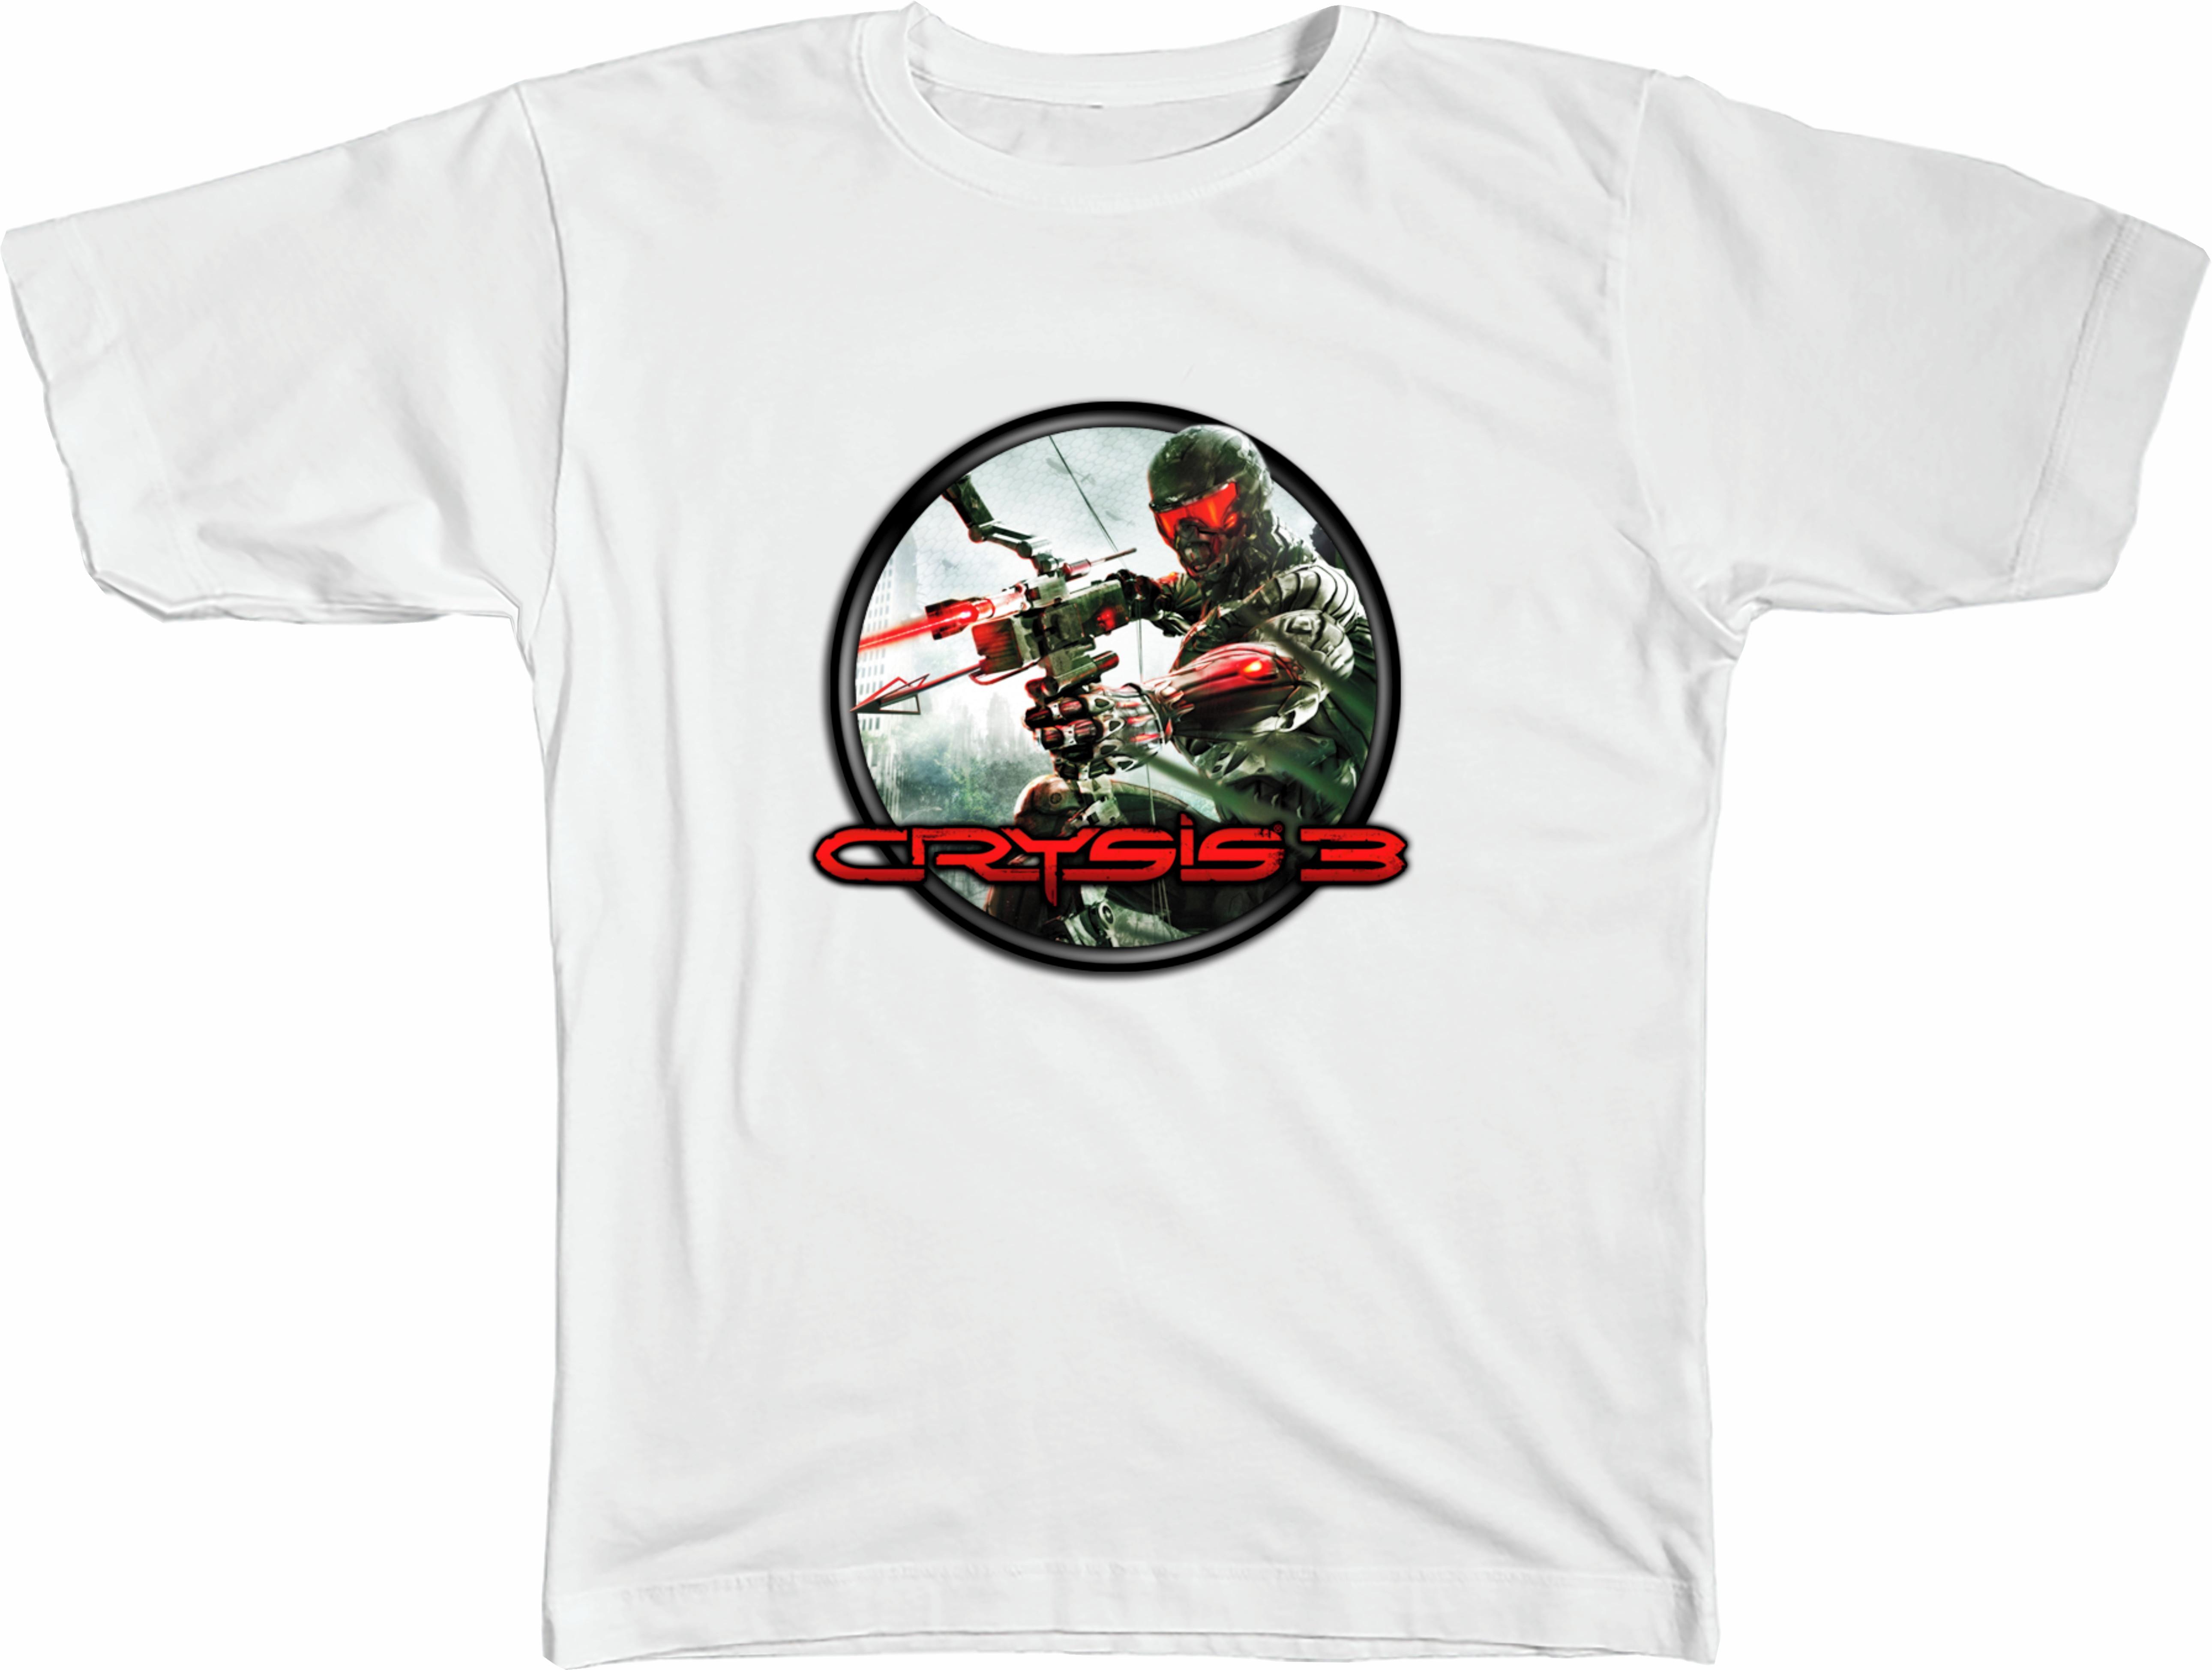 cf11cc0be Camiseta Logo do Ps1 Ps2 Ps3 e Ps4 Masculina Video Game